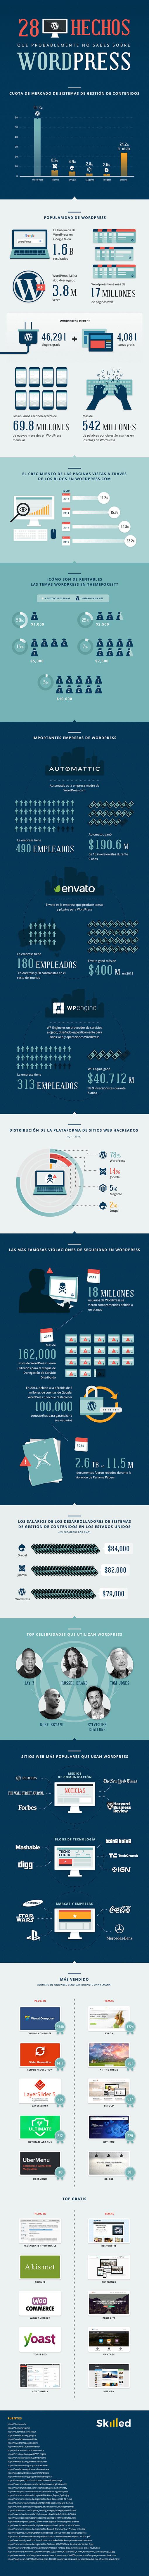 28 datos curiosos sobre WordPress ceslava 0